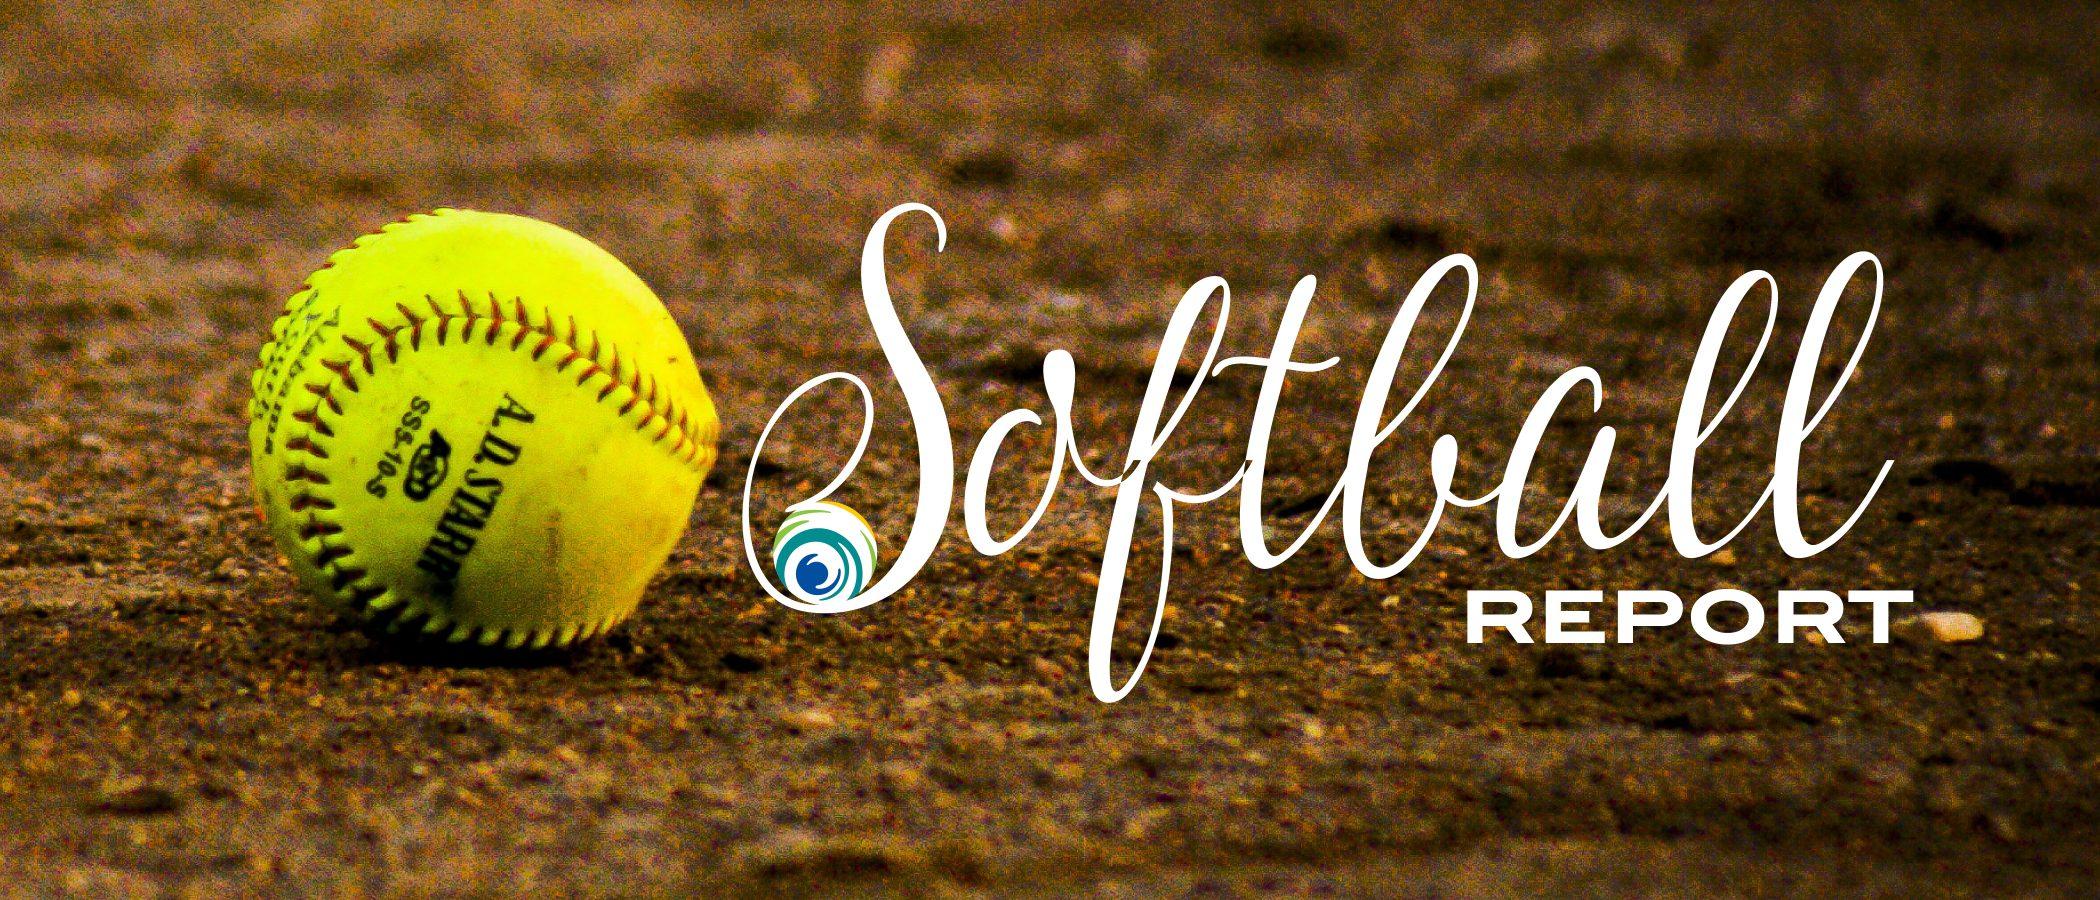 softball-report-11brd-dq2021-web-banner2x-100